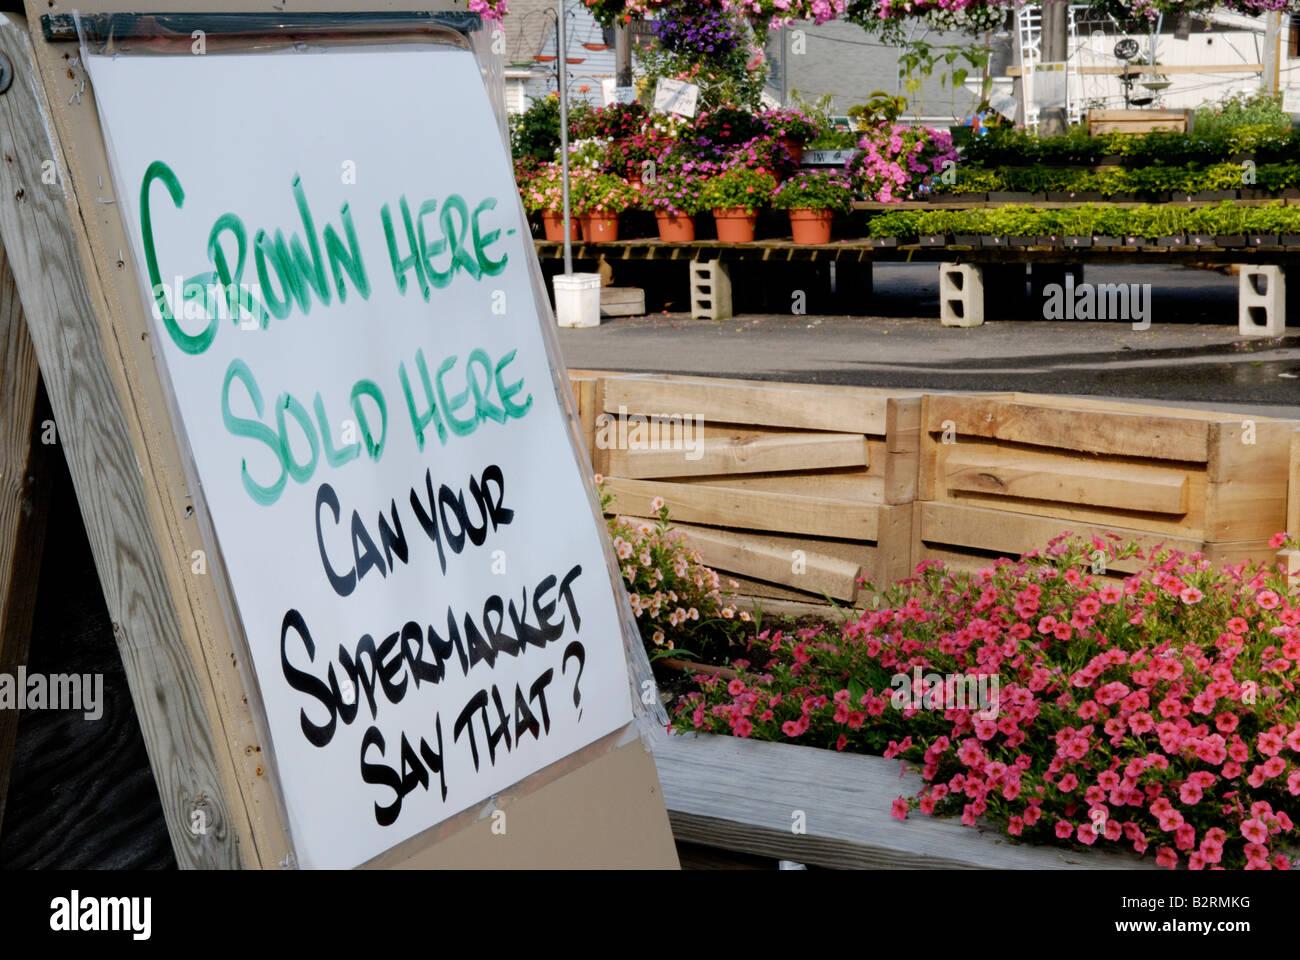 Farm market sign - locally grown - Stock Image